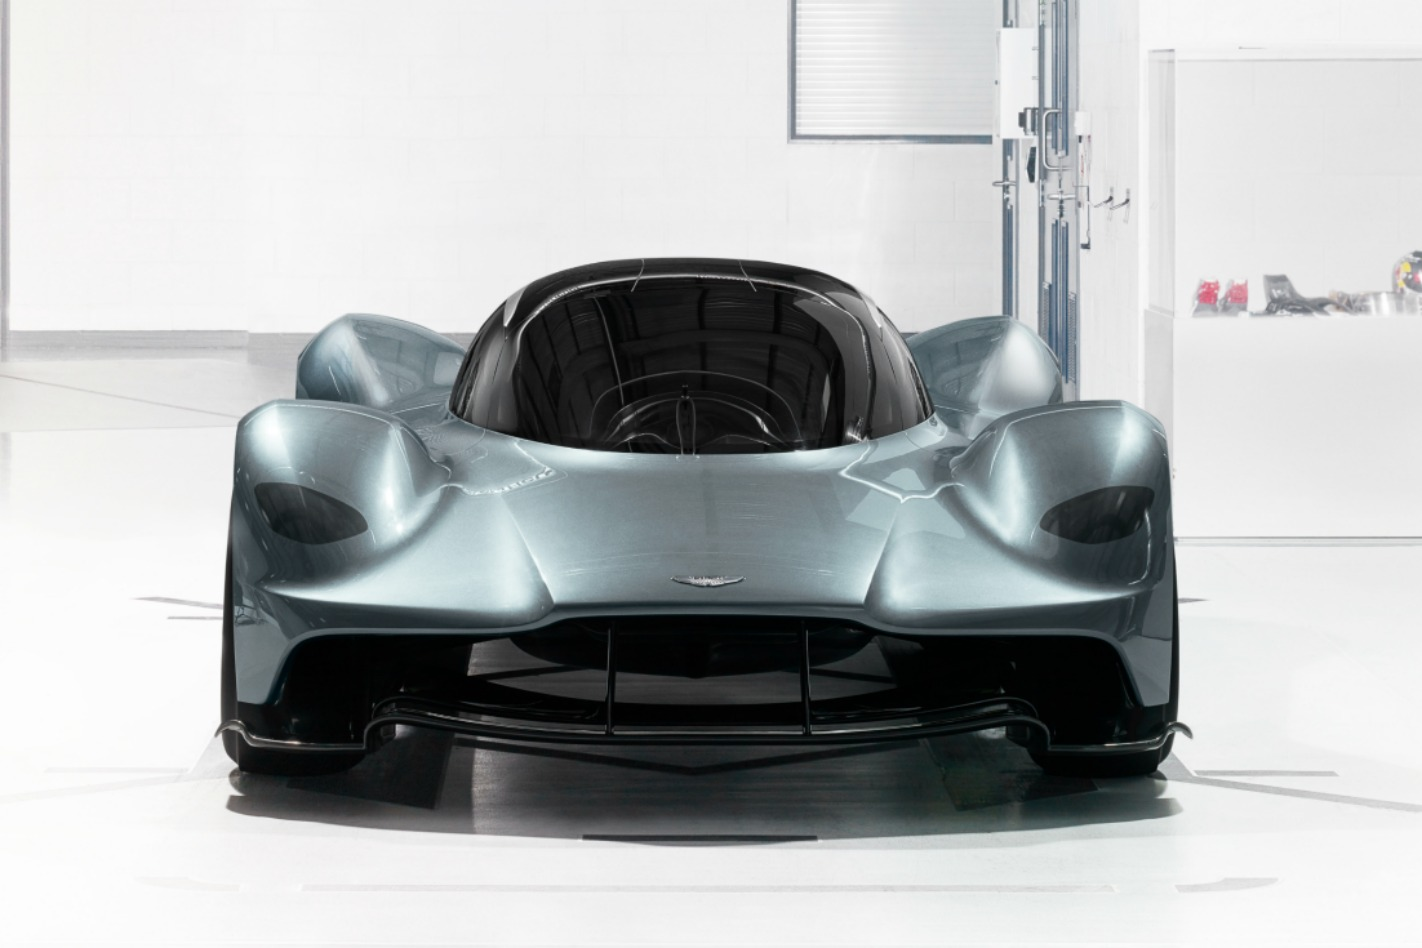 Aston Martin AM-RB 001 Front 2